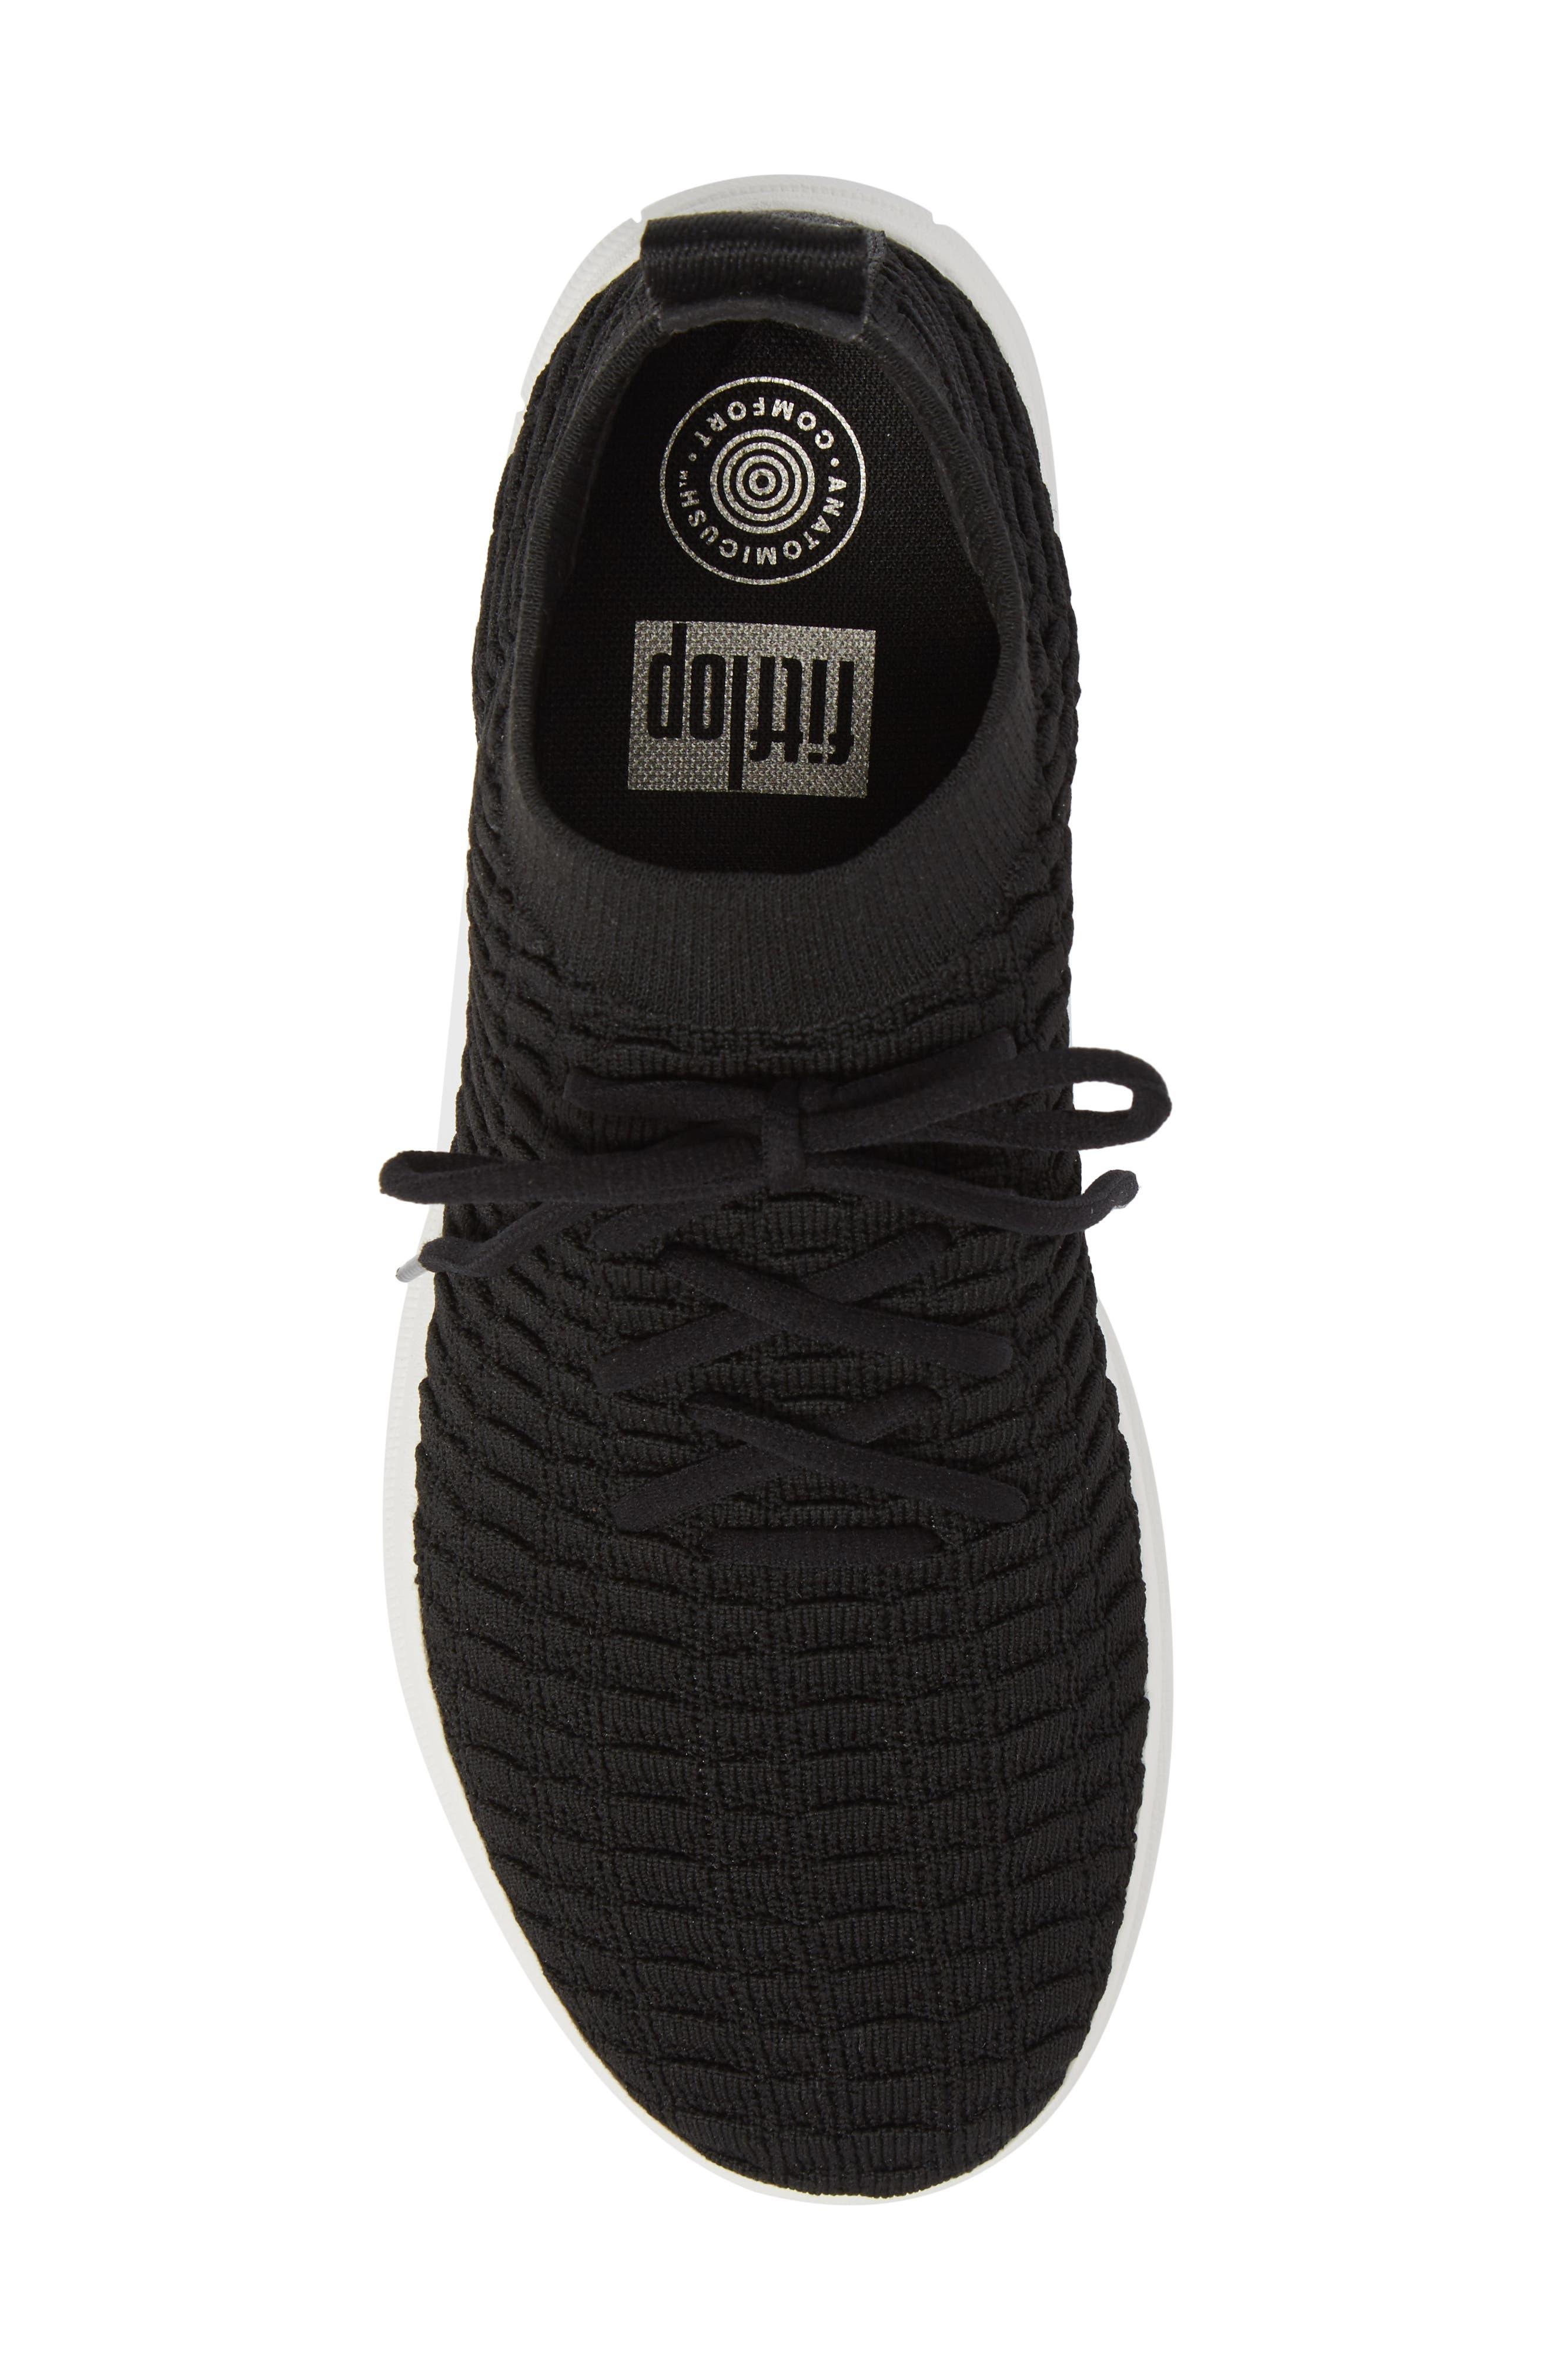 Uberknit<sup>™</sup> Slip-On High Top Sneaker,                             Alternate thumbnail 5, color,                             001